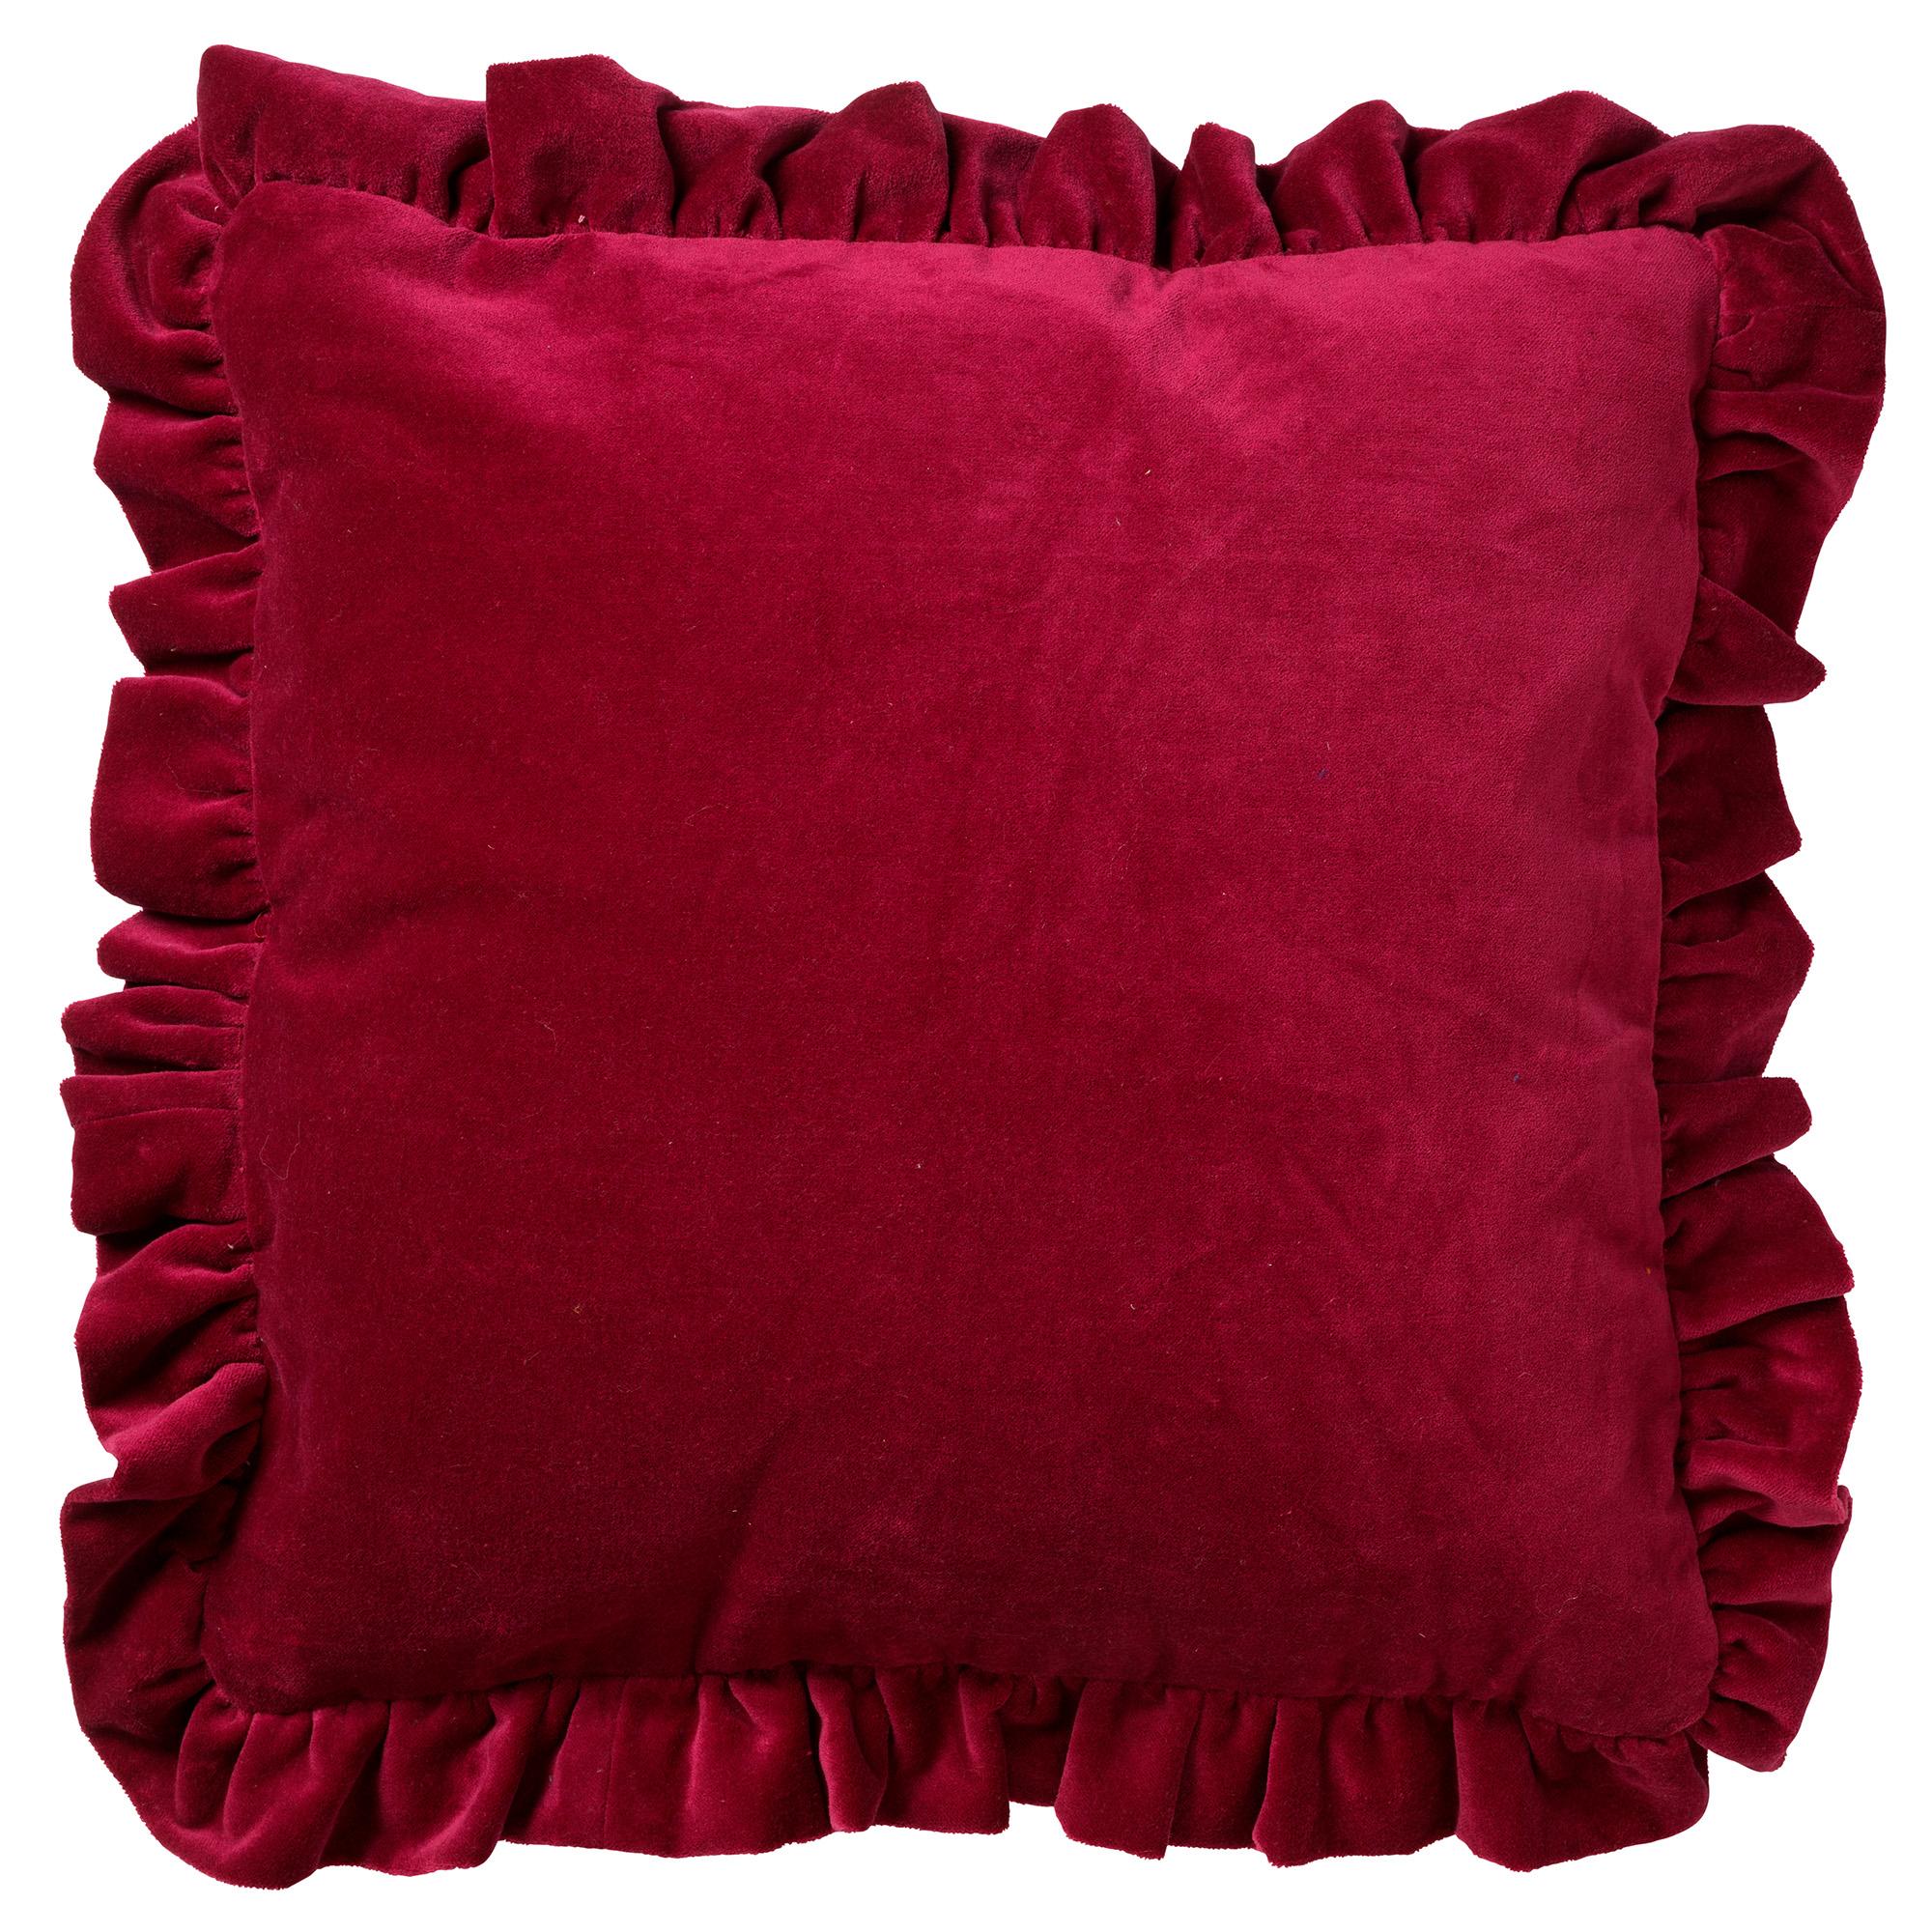 coussin en velours Prune rouge 45x45